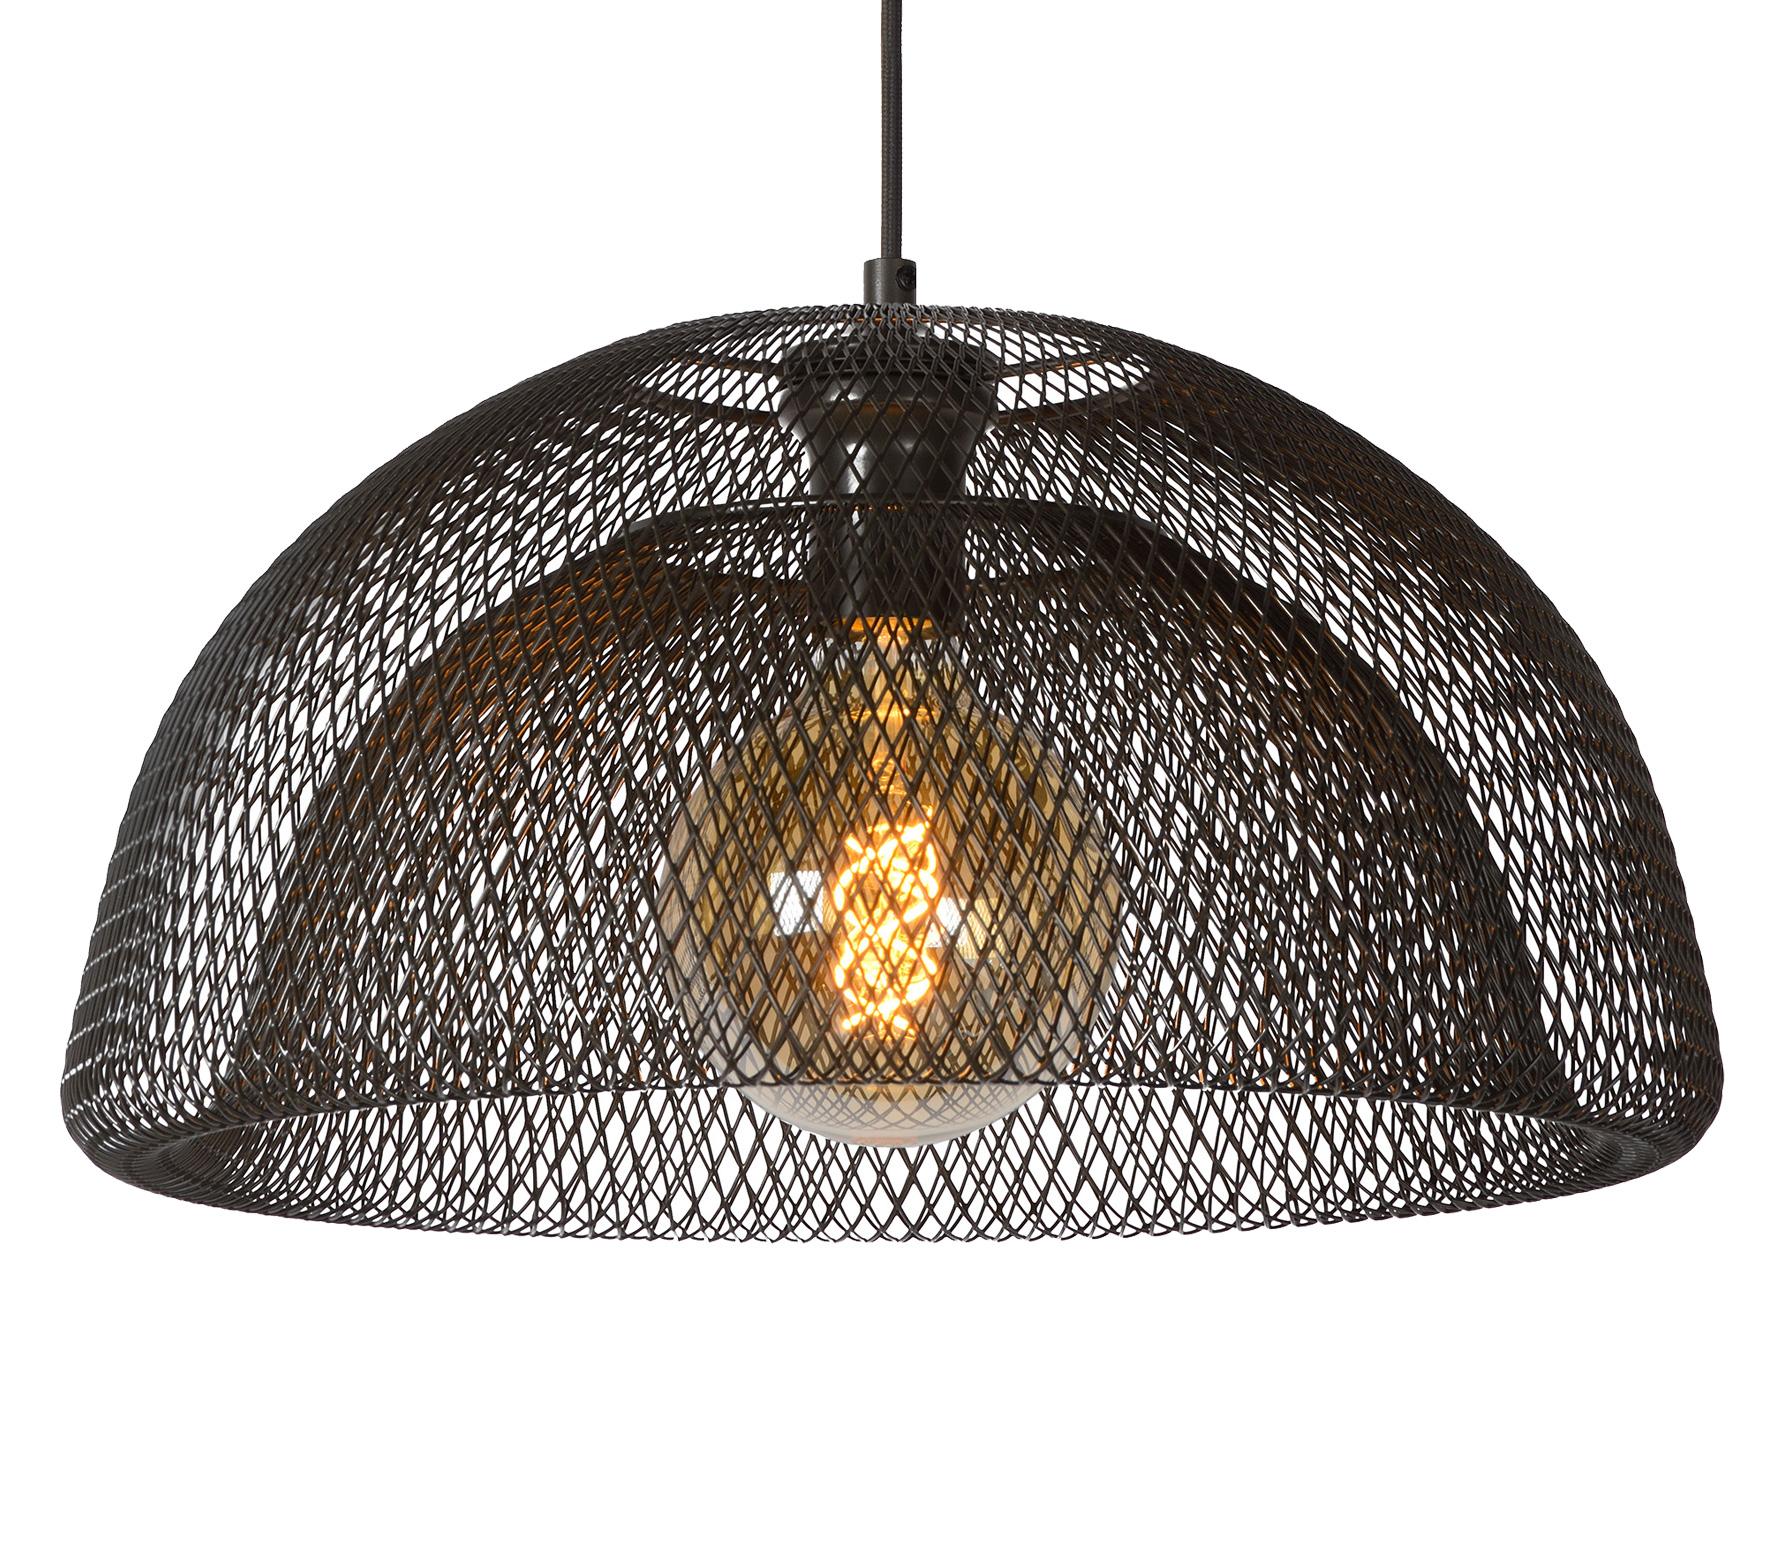 Lucide Mesh Hanglamp 46 cm - Zwart